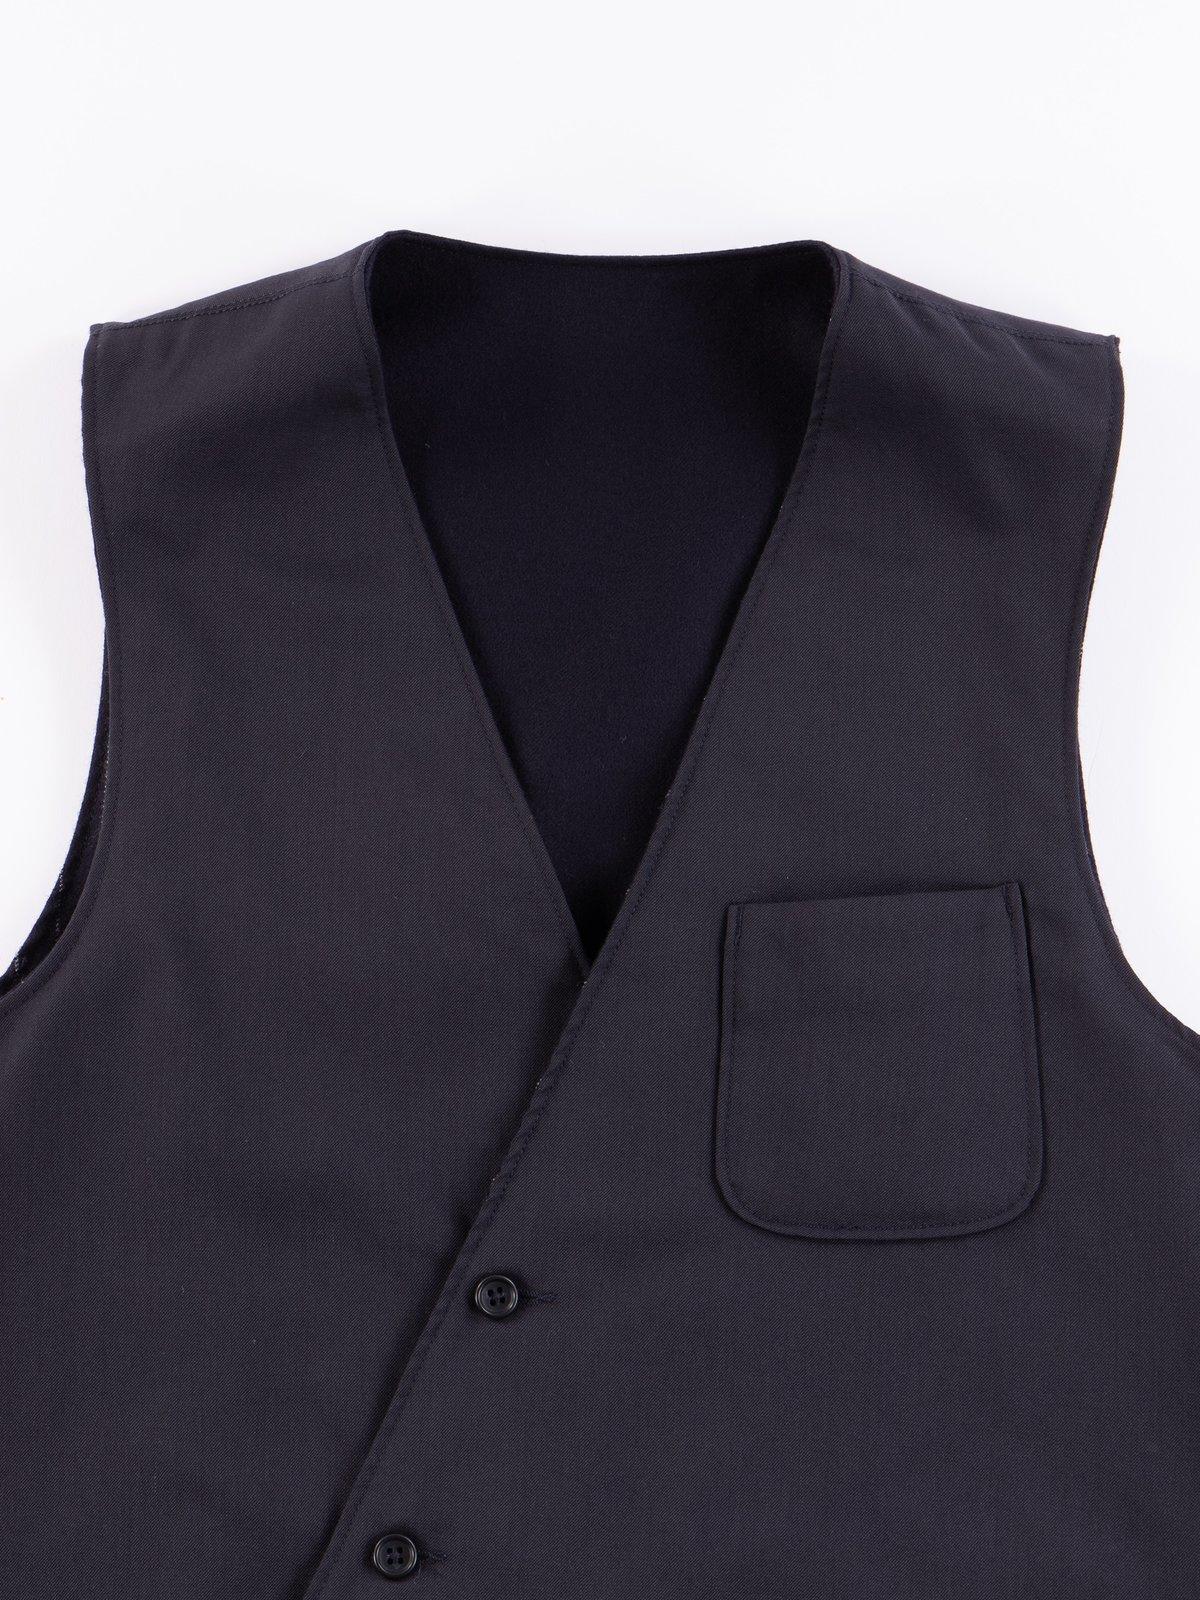 Dark Navy Worsted Wool Gabardine Reversible Vest - Image 3